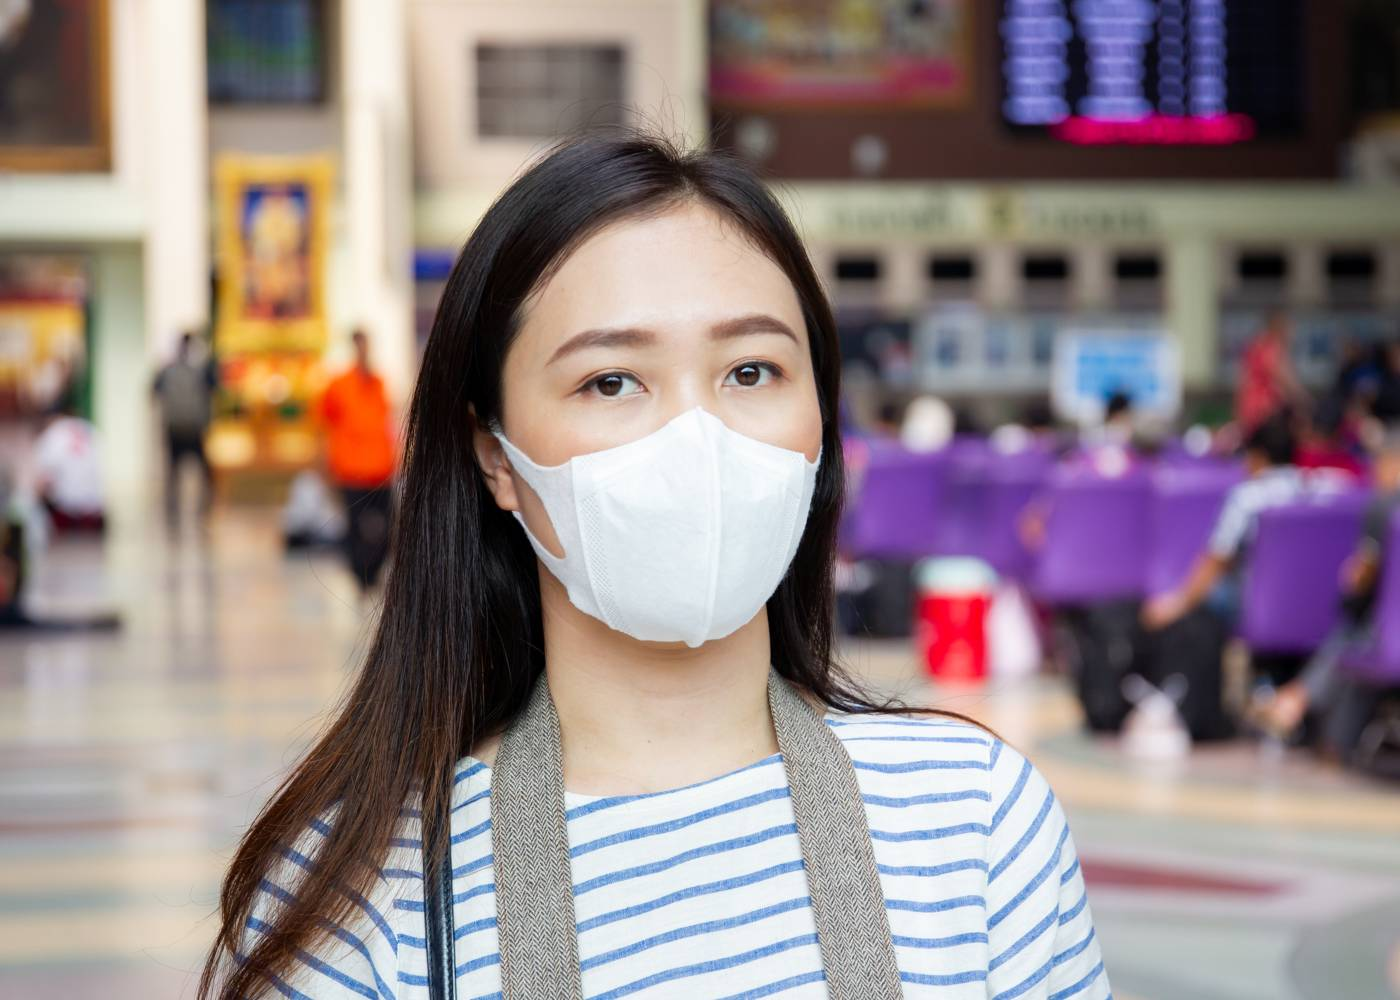 Mulher protege-se do coronavirus